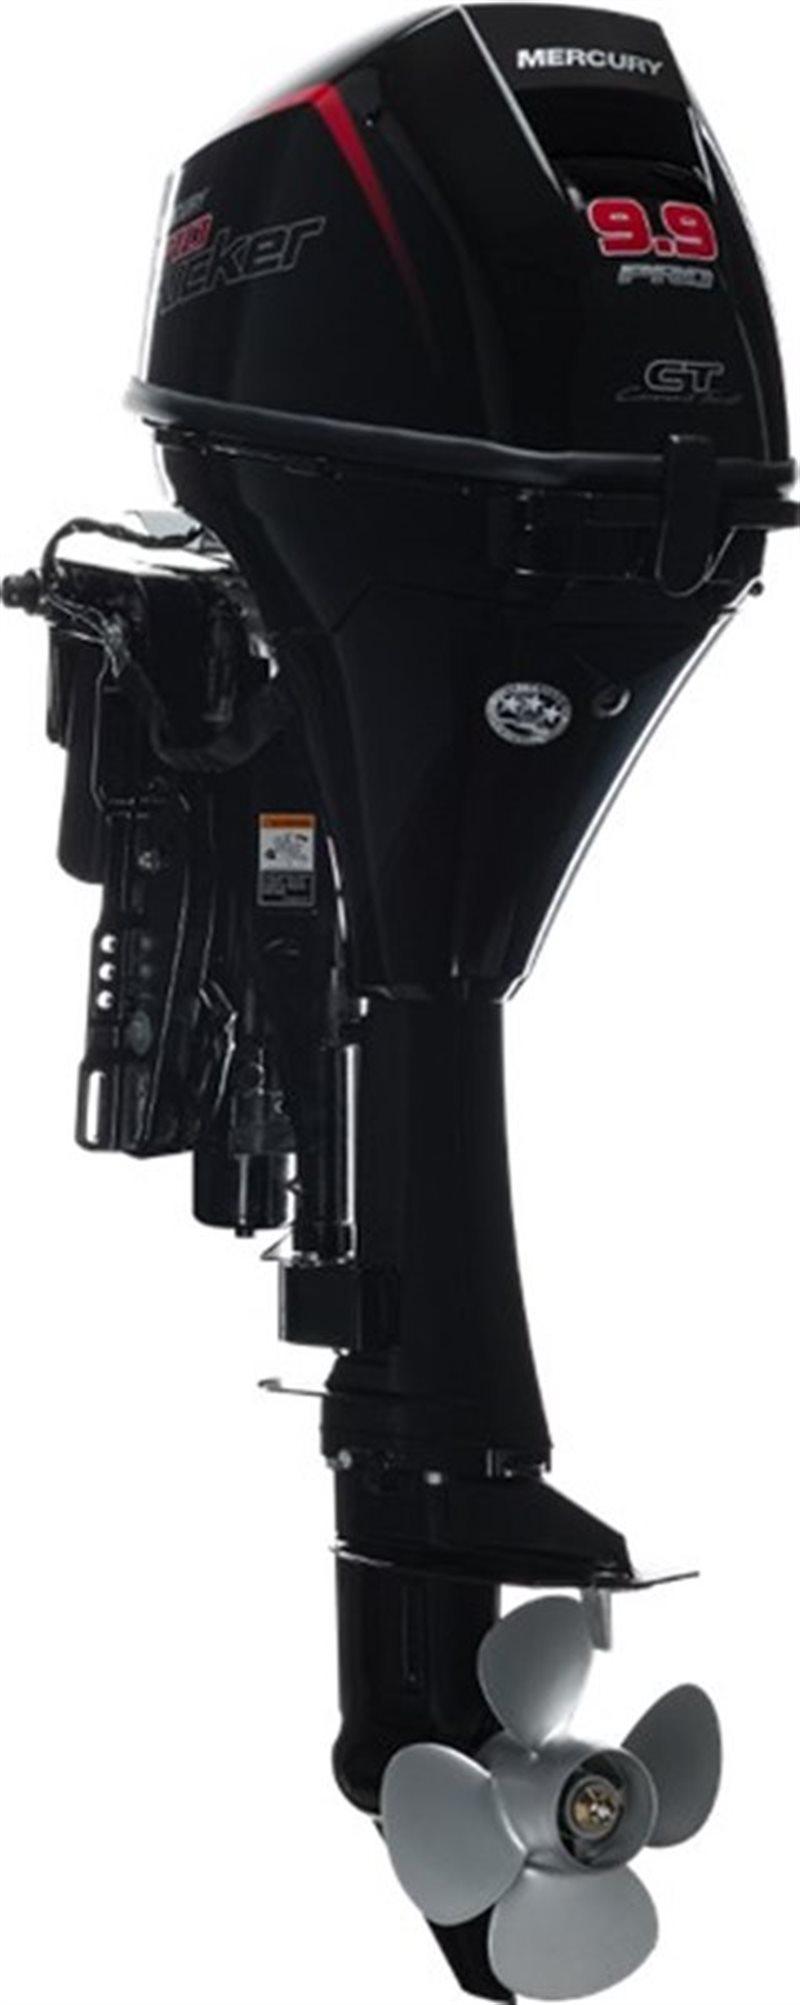 99 hp ProKicker at Pharo Marine, Waunakee, WI 53597